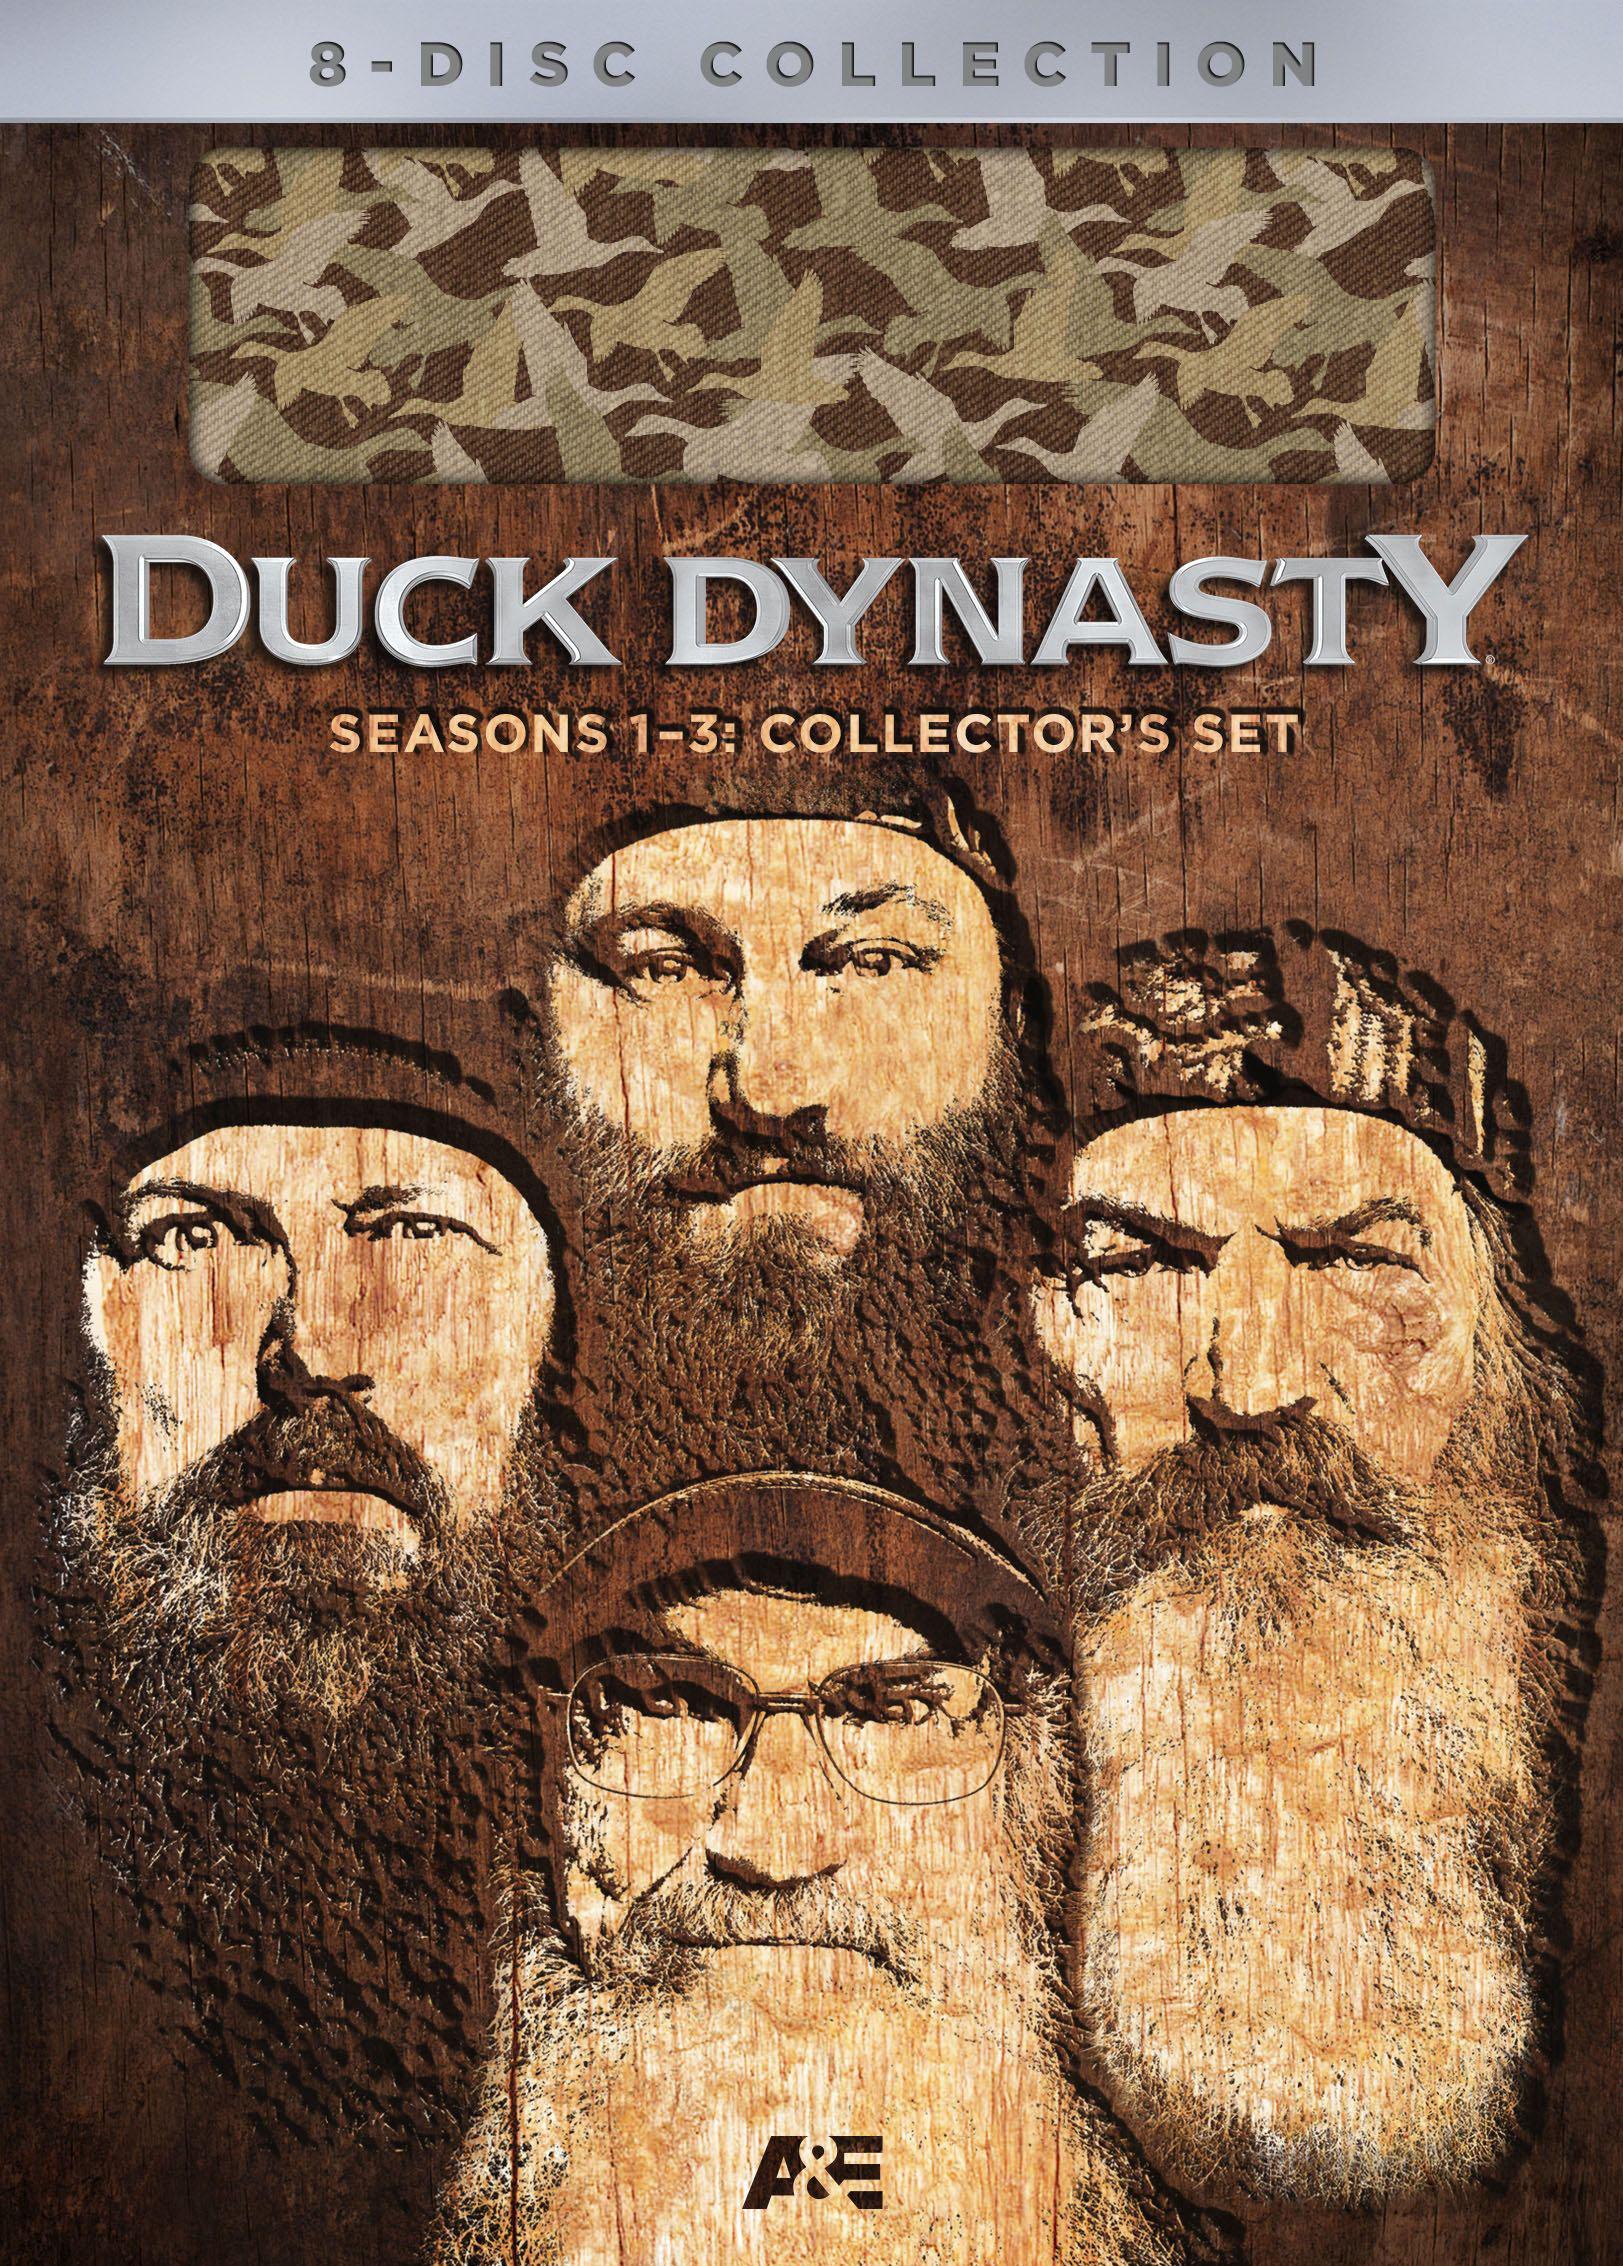 Duck Dynasty: Seasons 1-3 Collector's Set [8 Discs] (dvd) 2868473